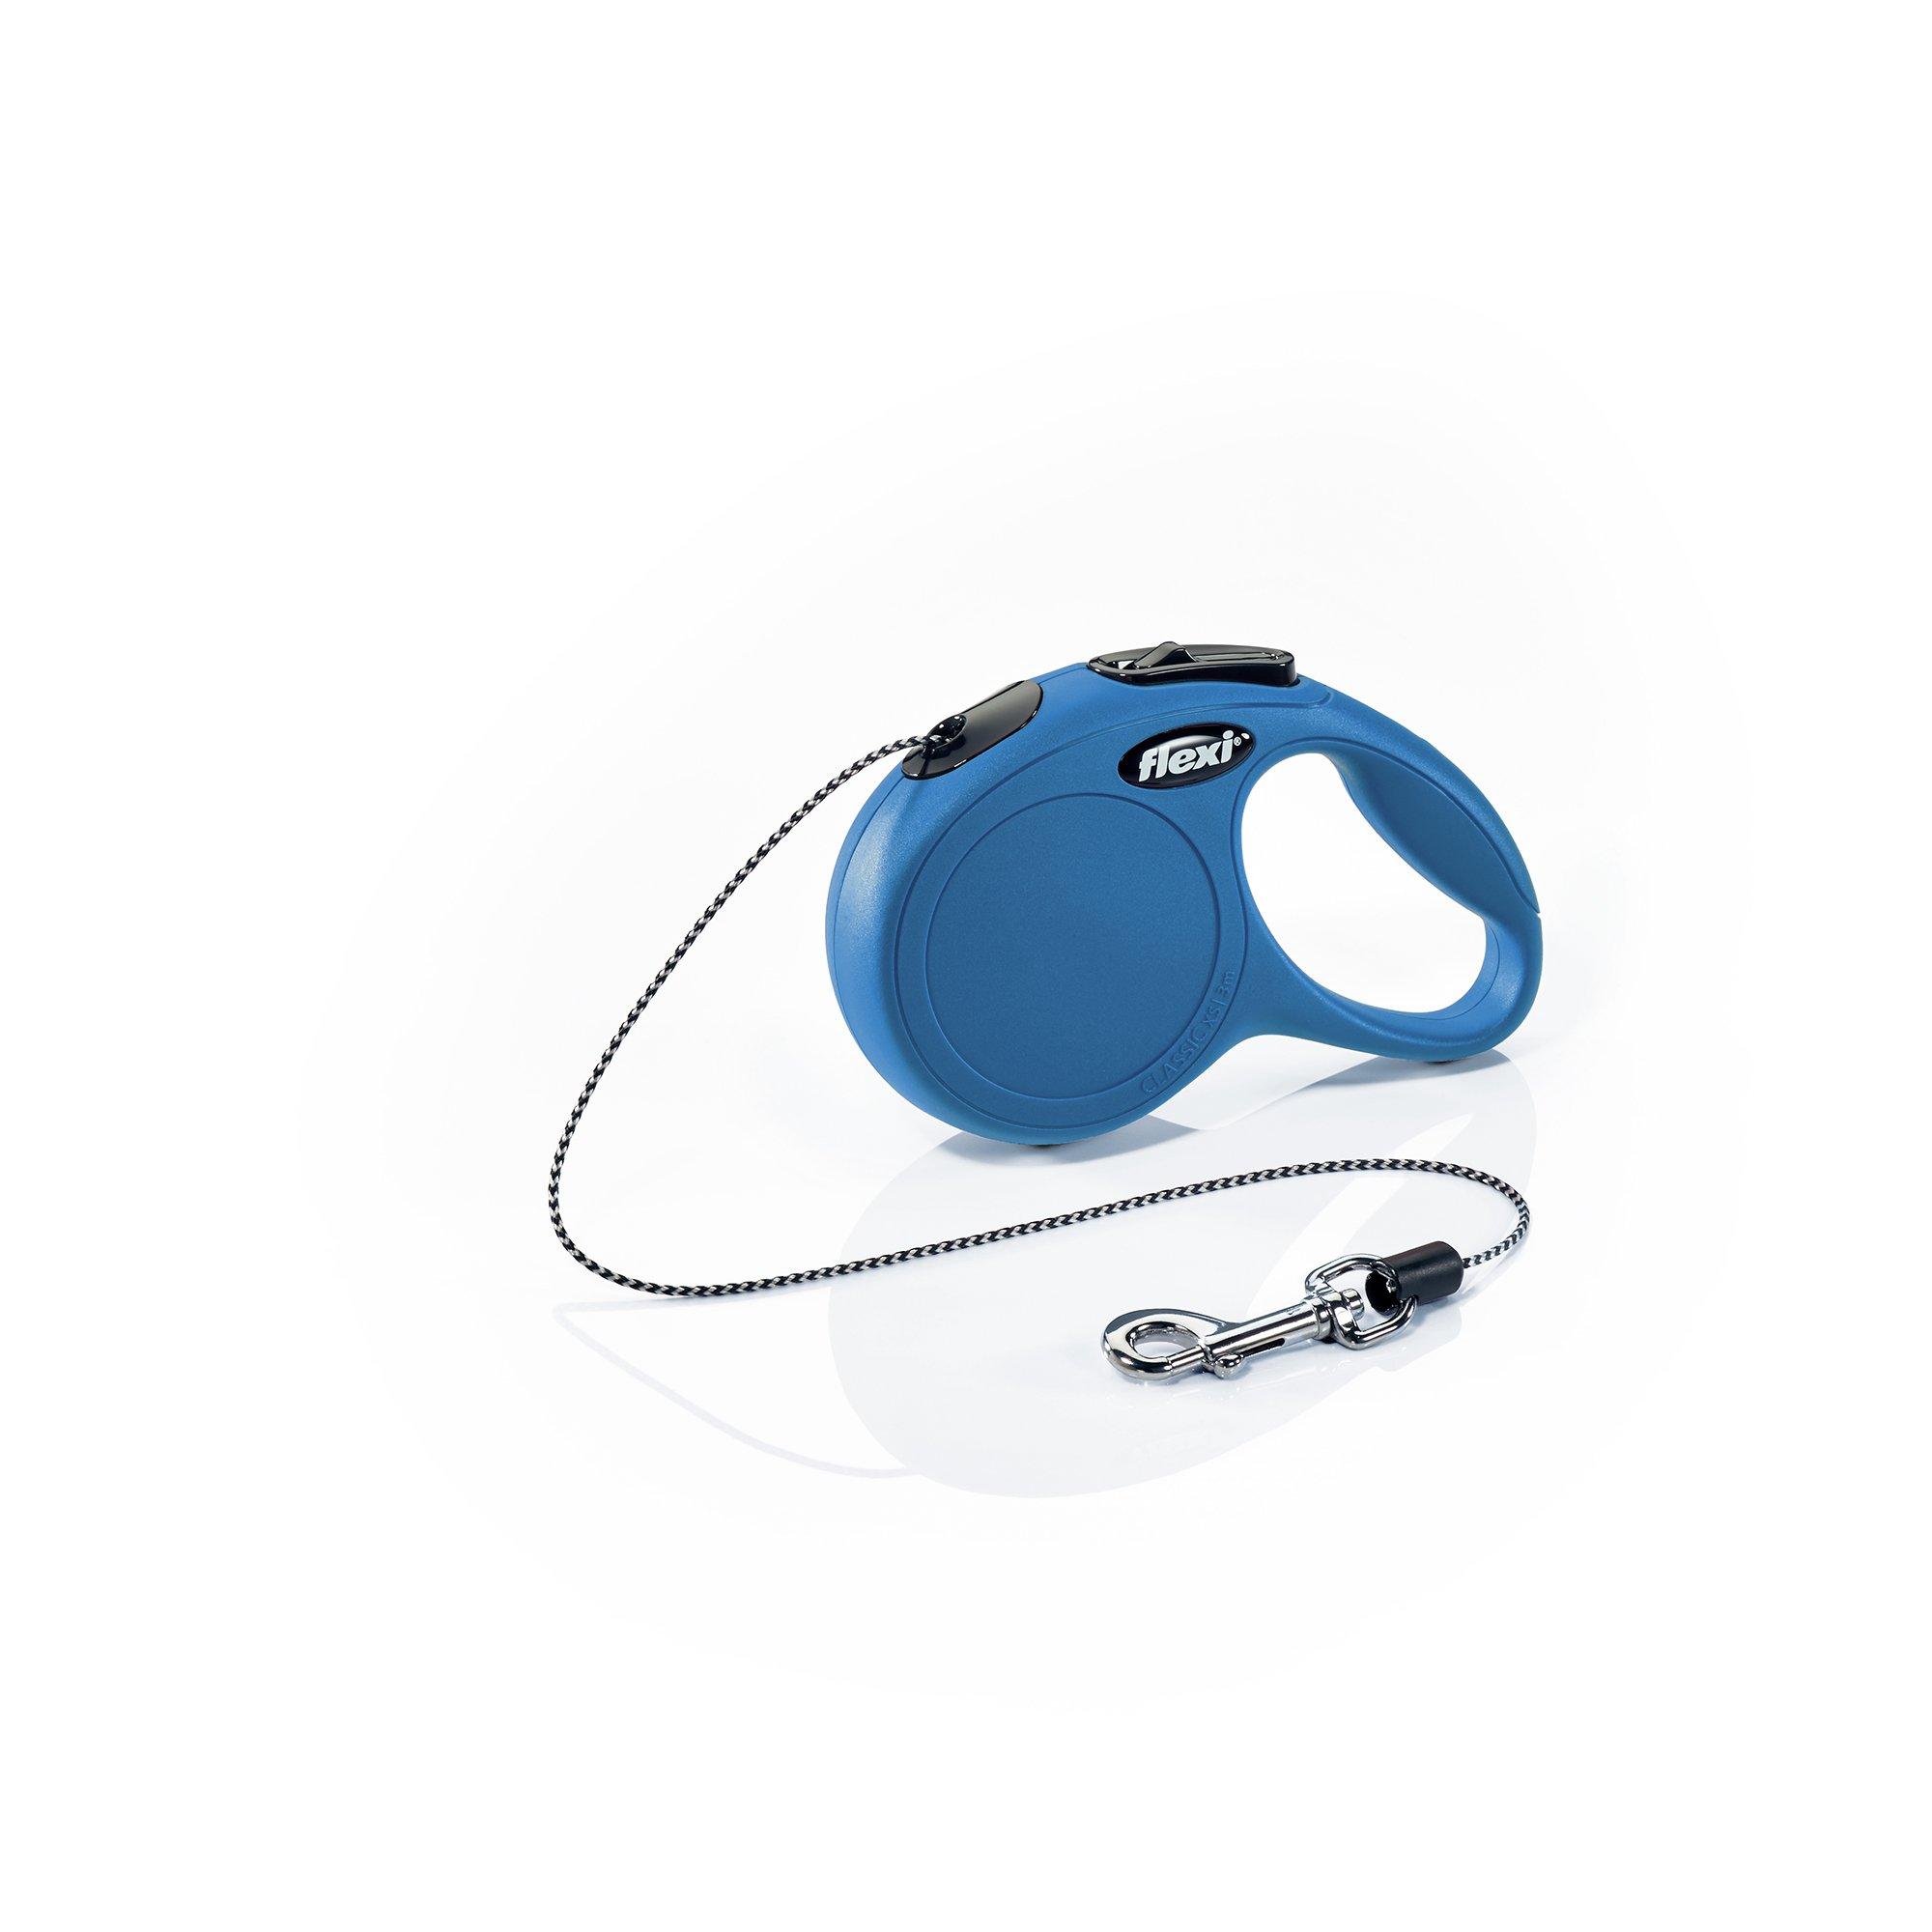 Flexi Classic Cord Leash, X-Small Cord, 10-Feet - Blue